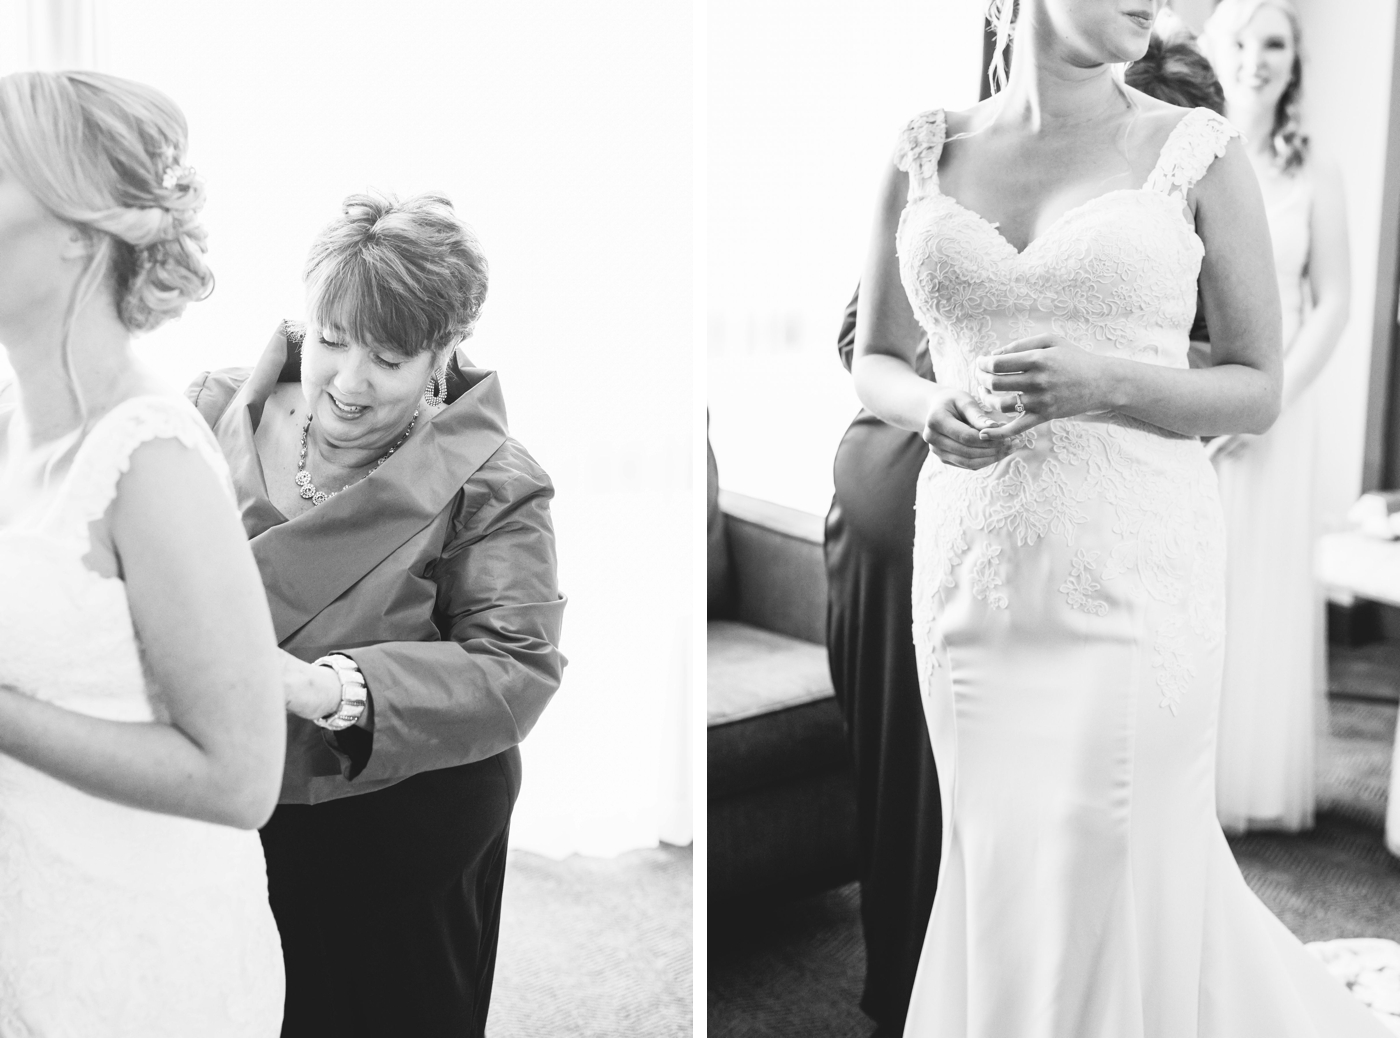 lake-geneva-fine-art-wedding-photography-mesley17